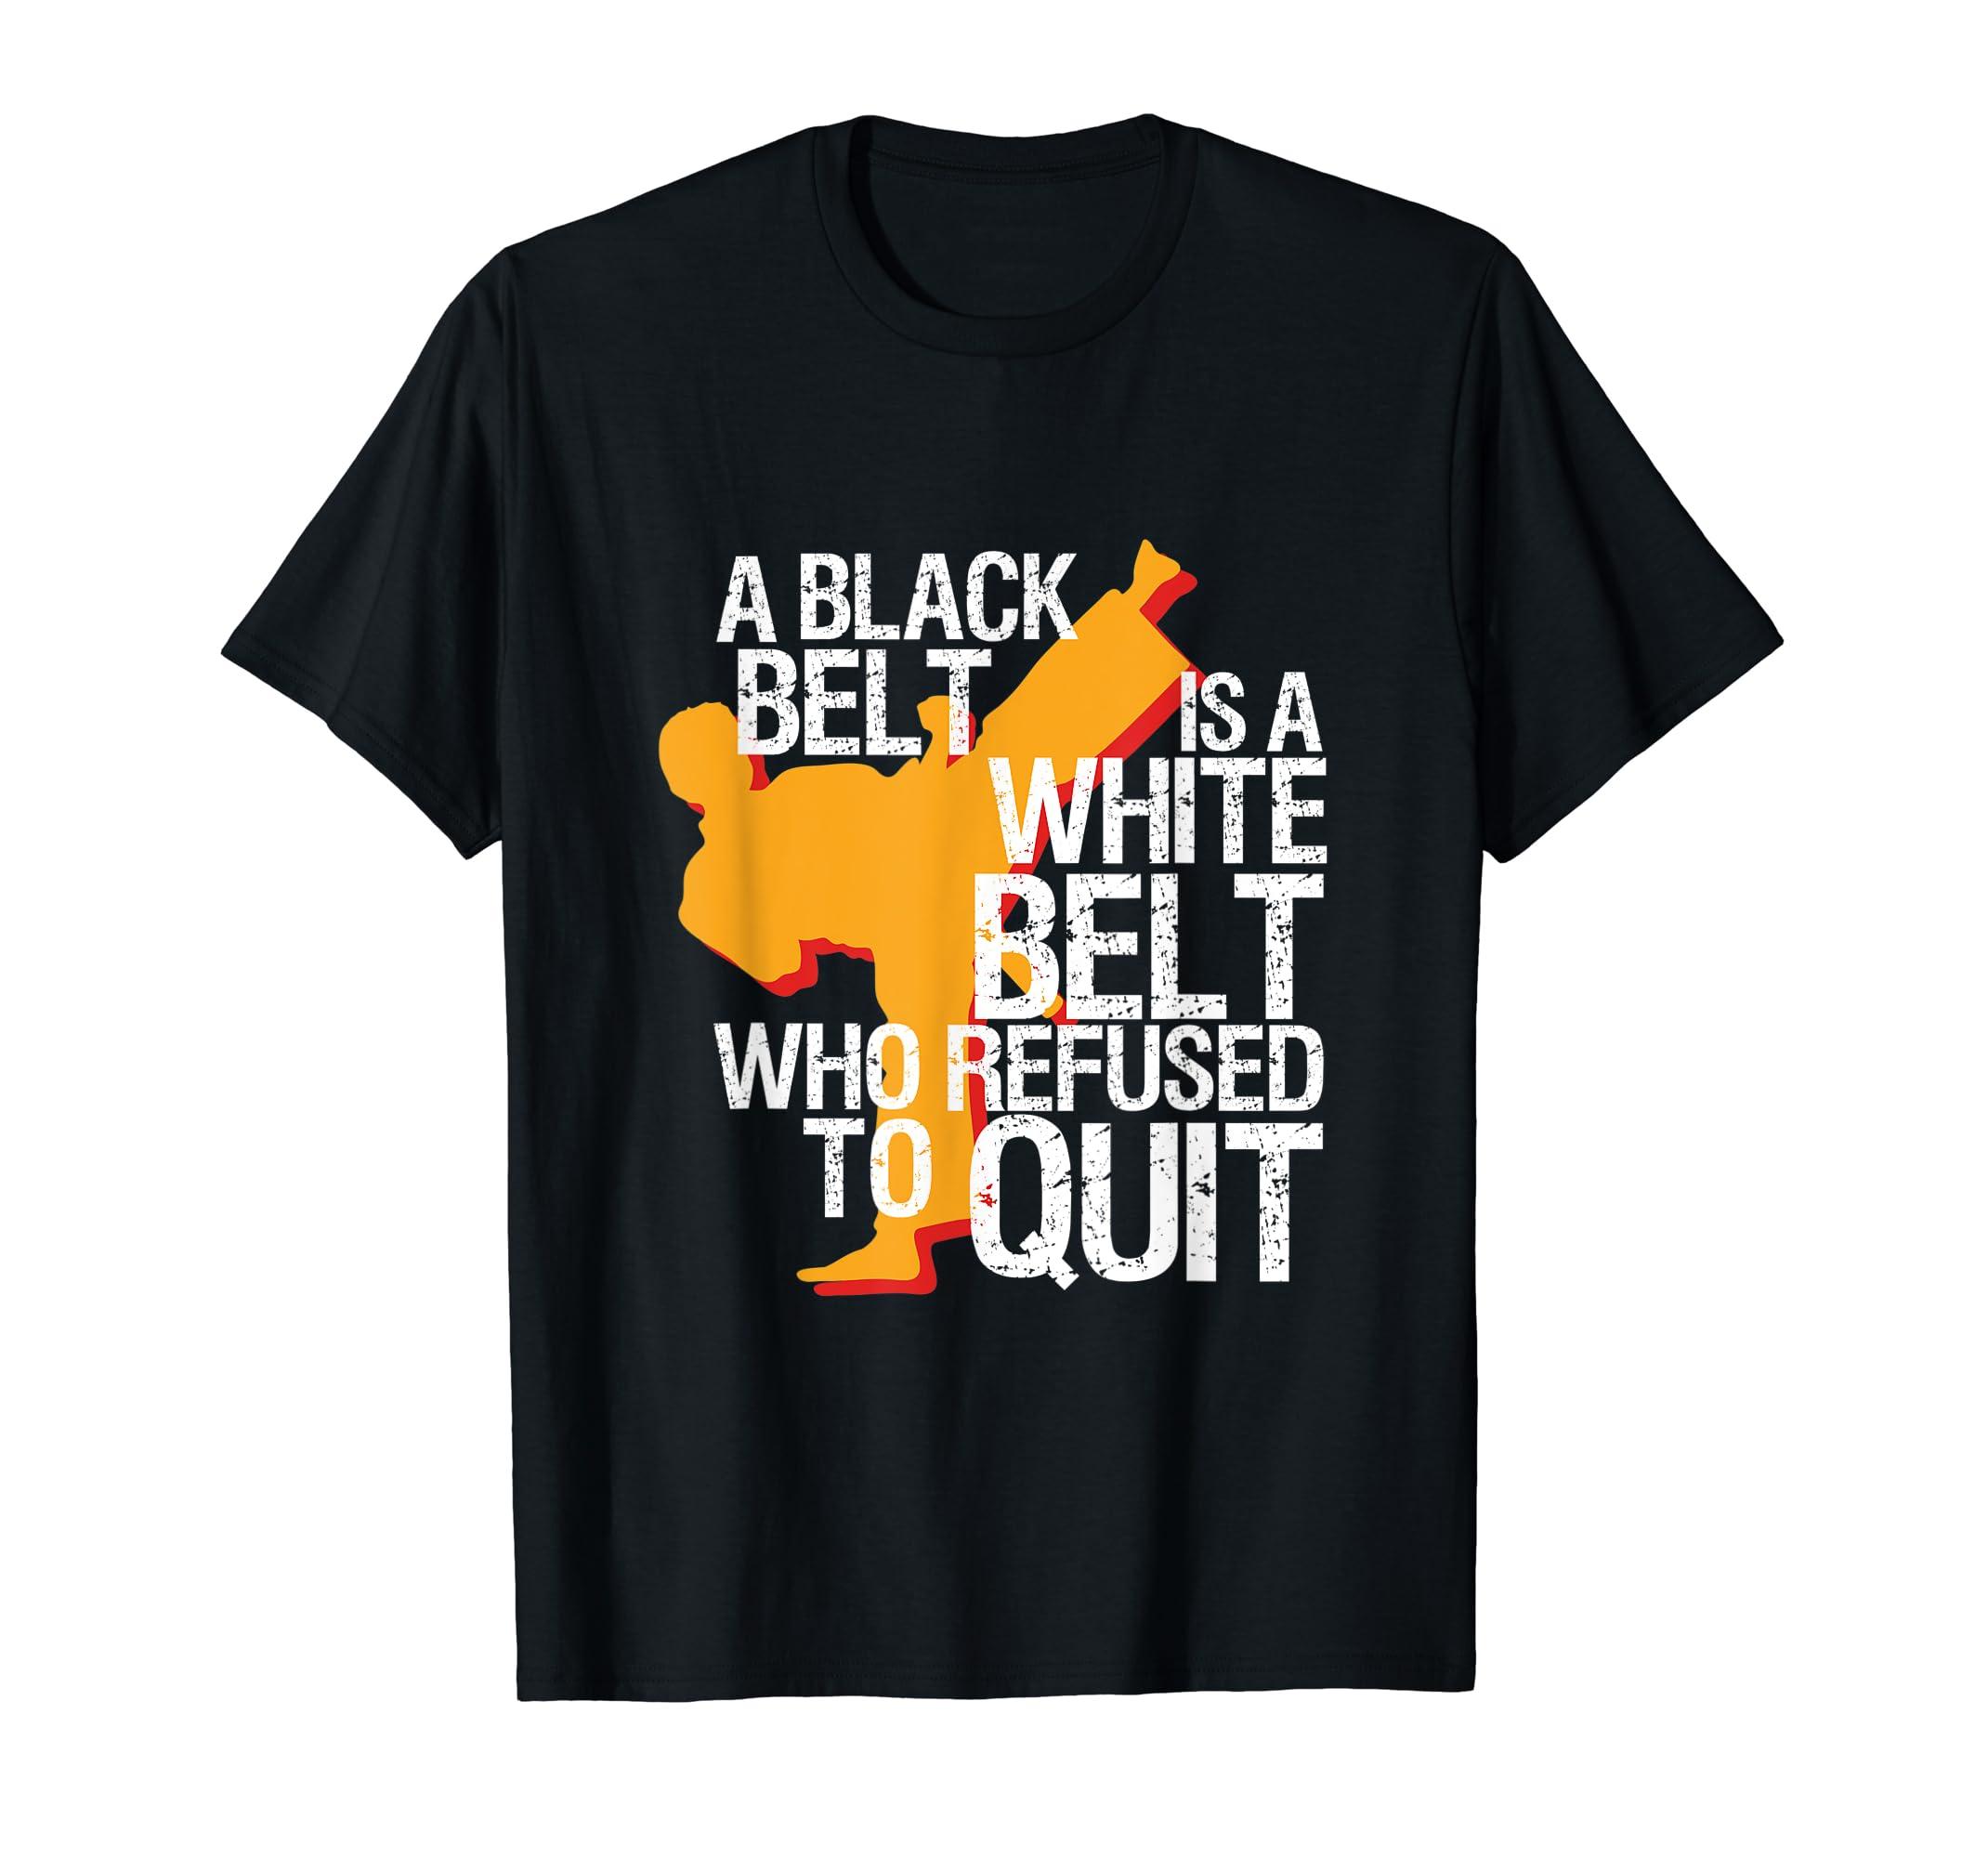 Taekwondo and Karate Black Belt Martial Art Student T-shirt-Men's T-Shirt-Black